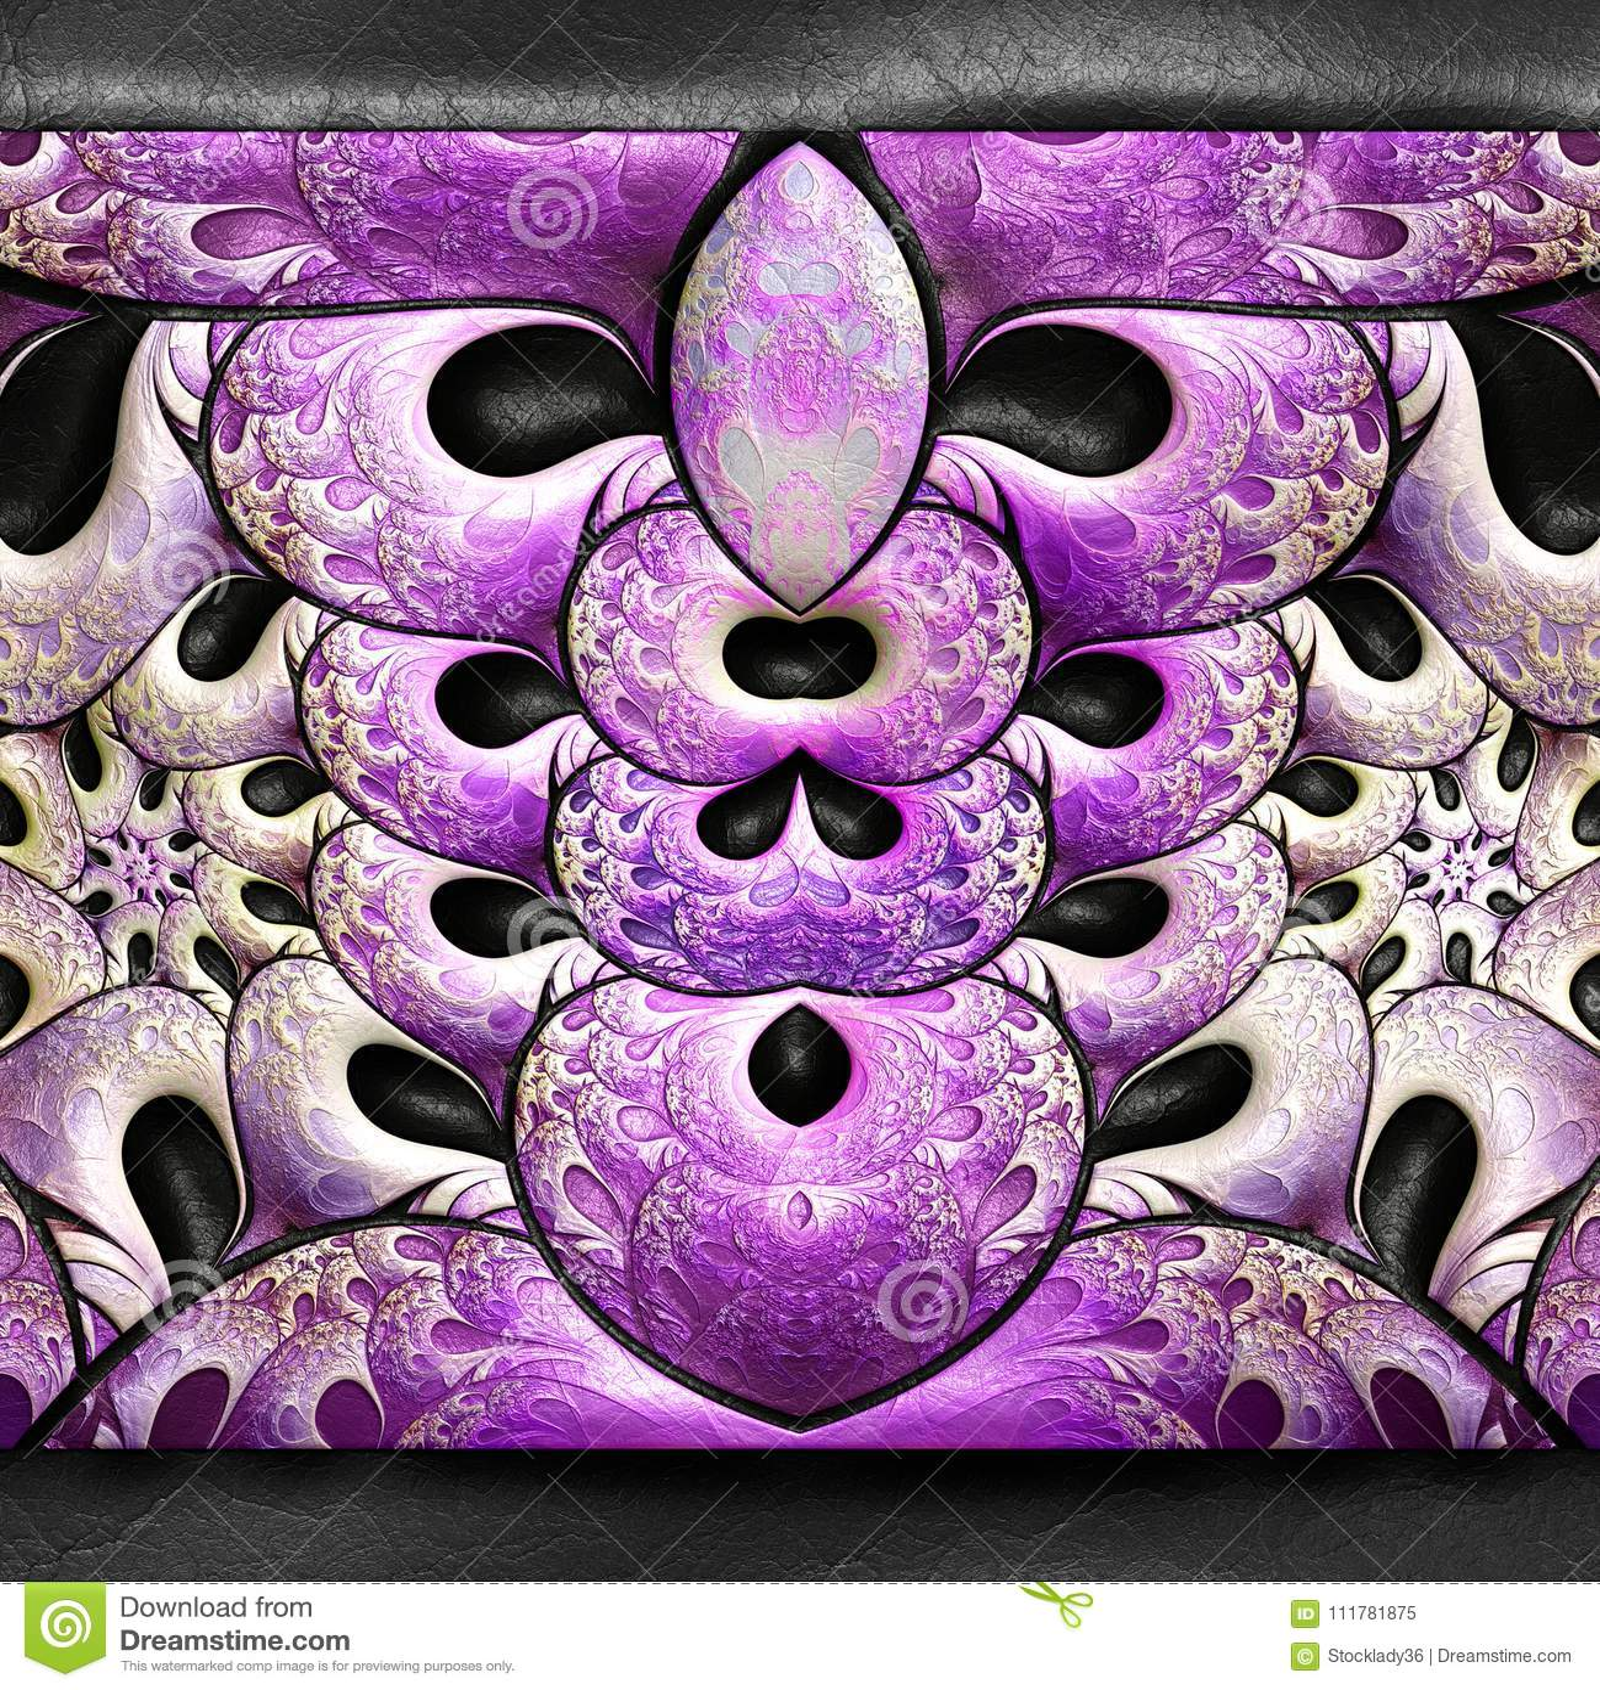 3D rendering plastikowy fractal na skórze